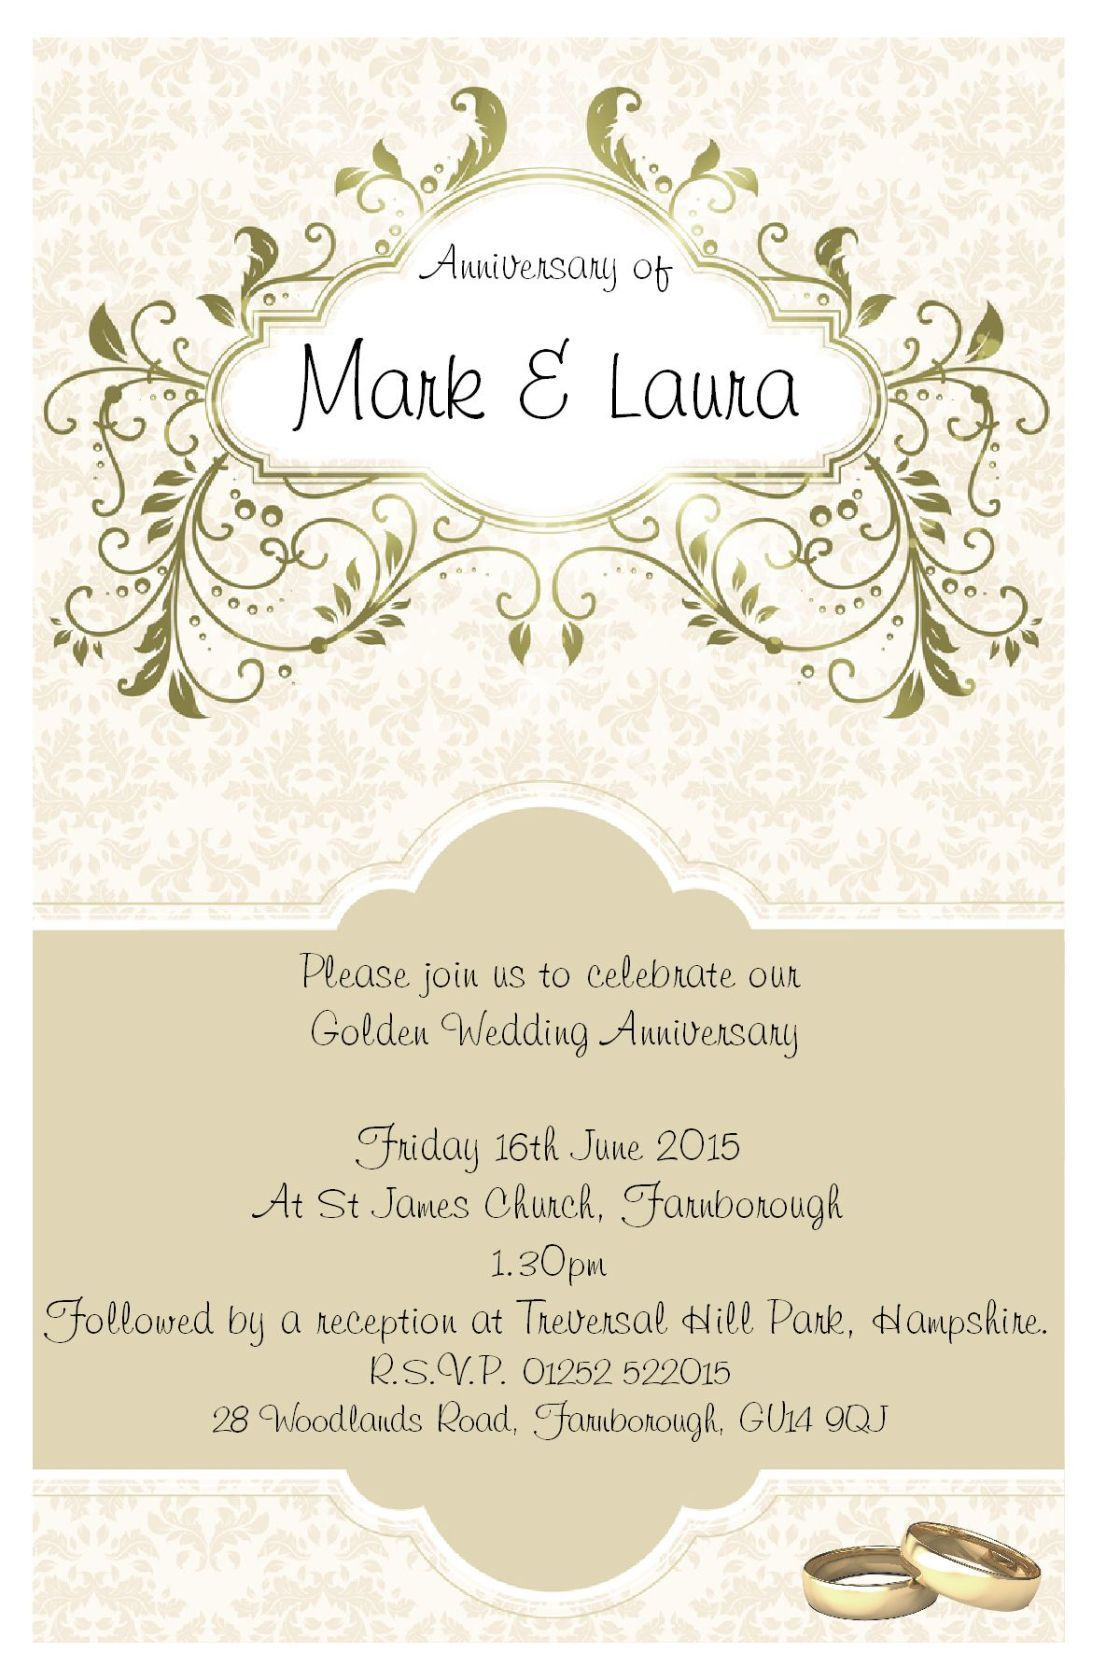 007 Stunning 50th Wedding Anniversary Party Invitation Template Sample  Templates FreeFull